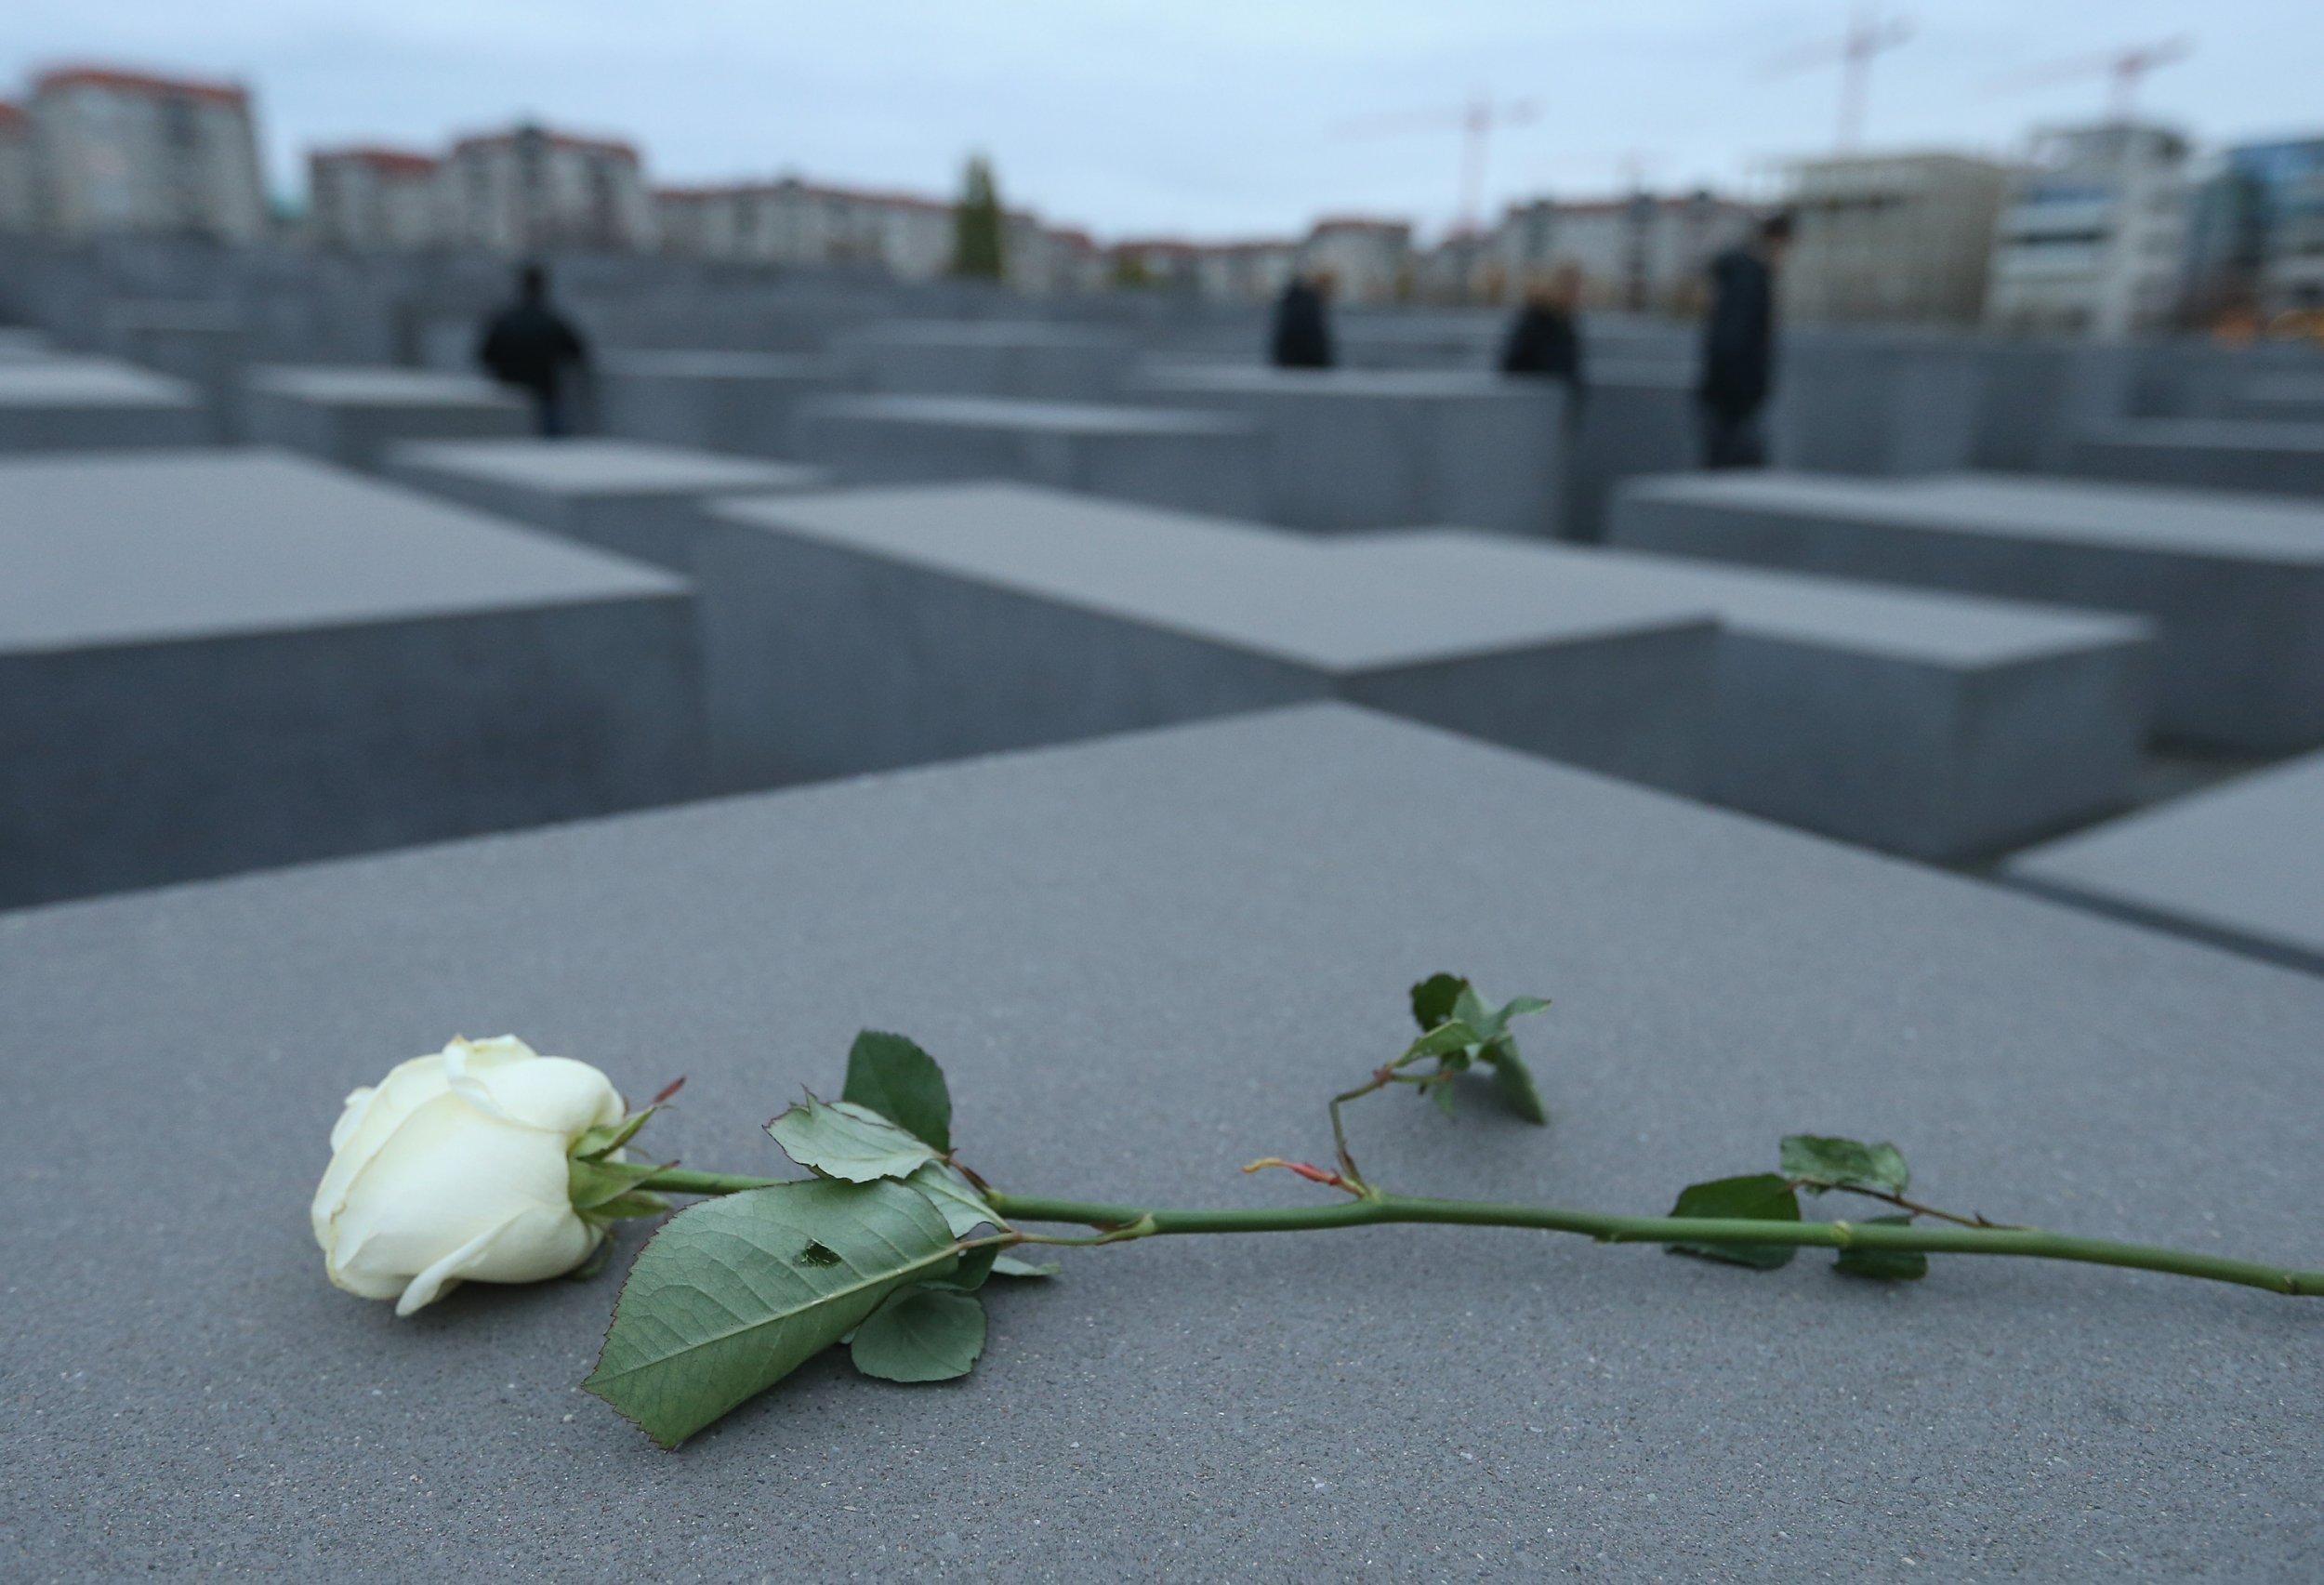 Holocaust memorial Berlin neo-Nazis